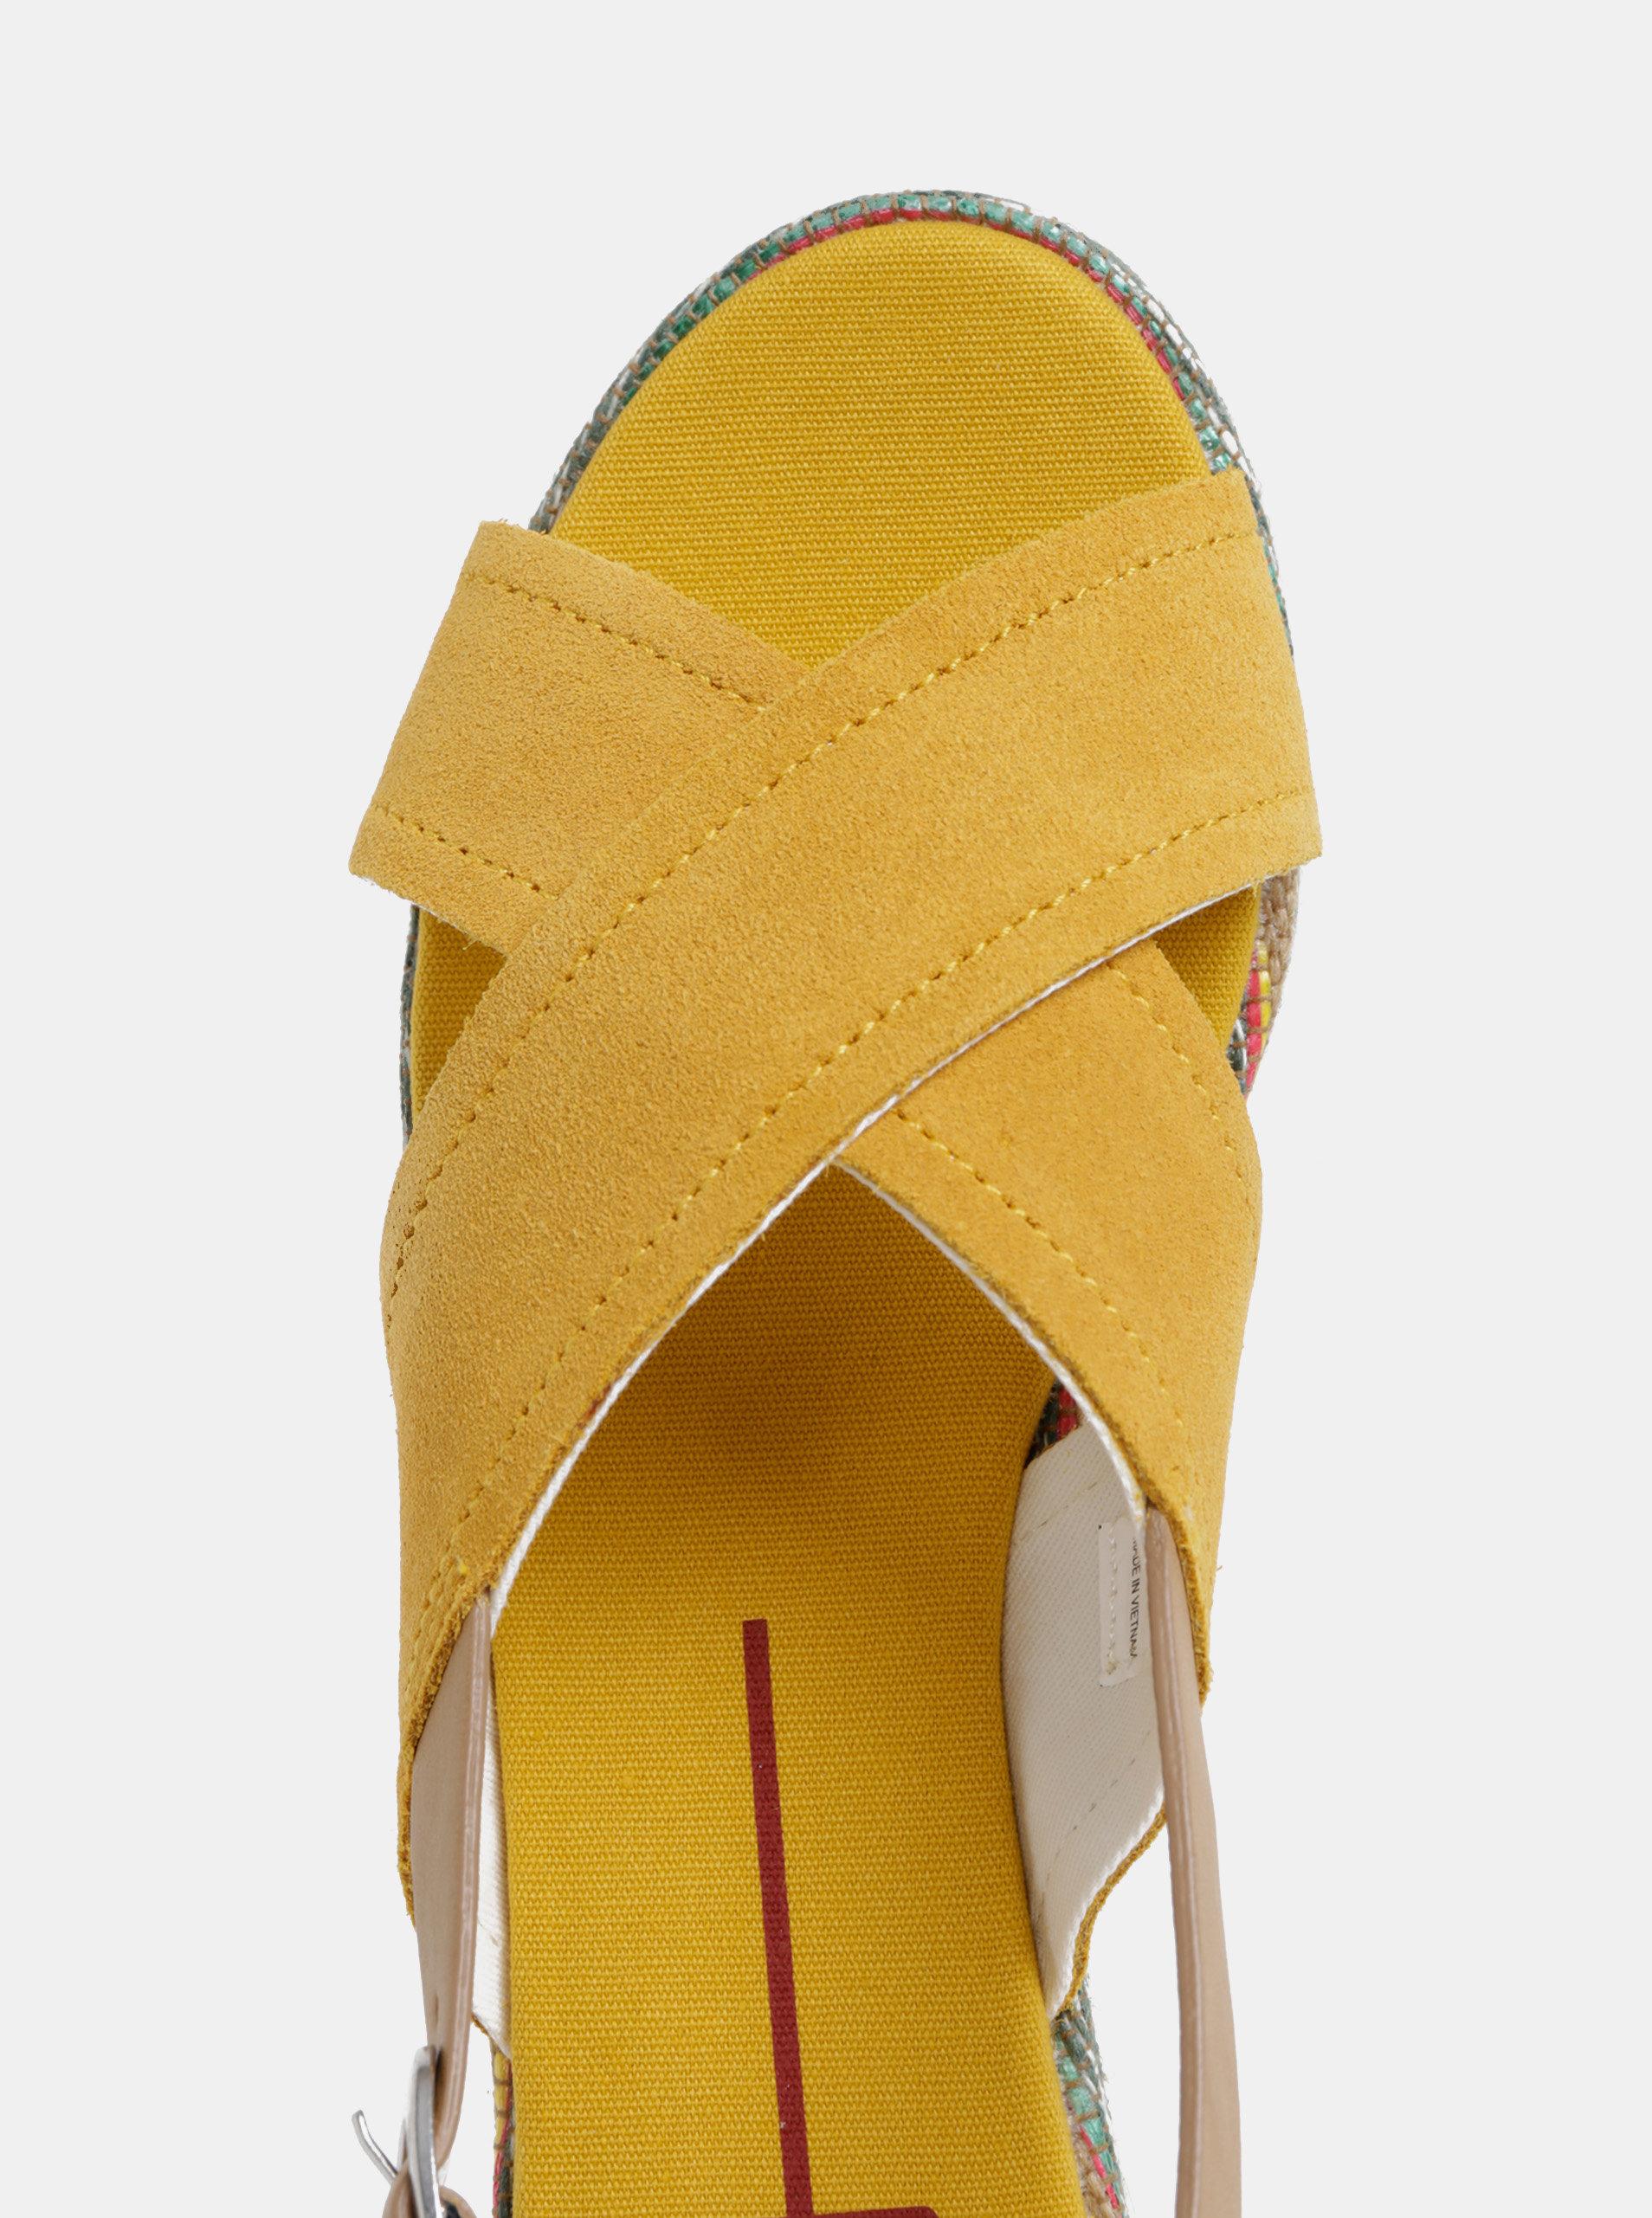 56ebc873a4a3 Horčicové dámske semišové sandále U.S. Polo Assn. ...